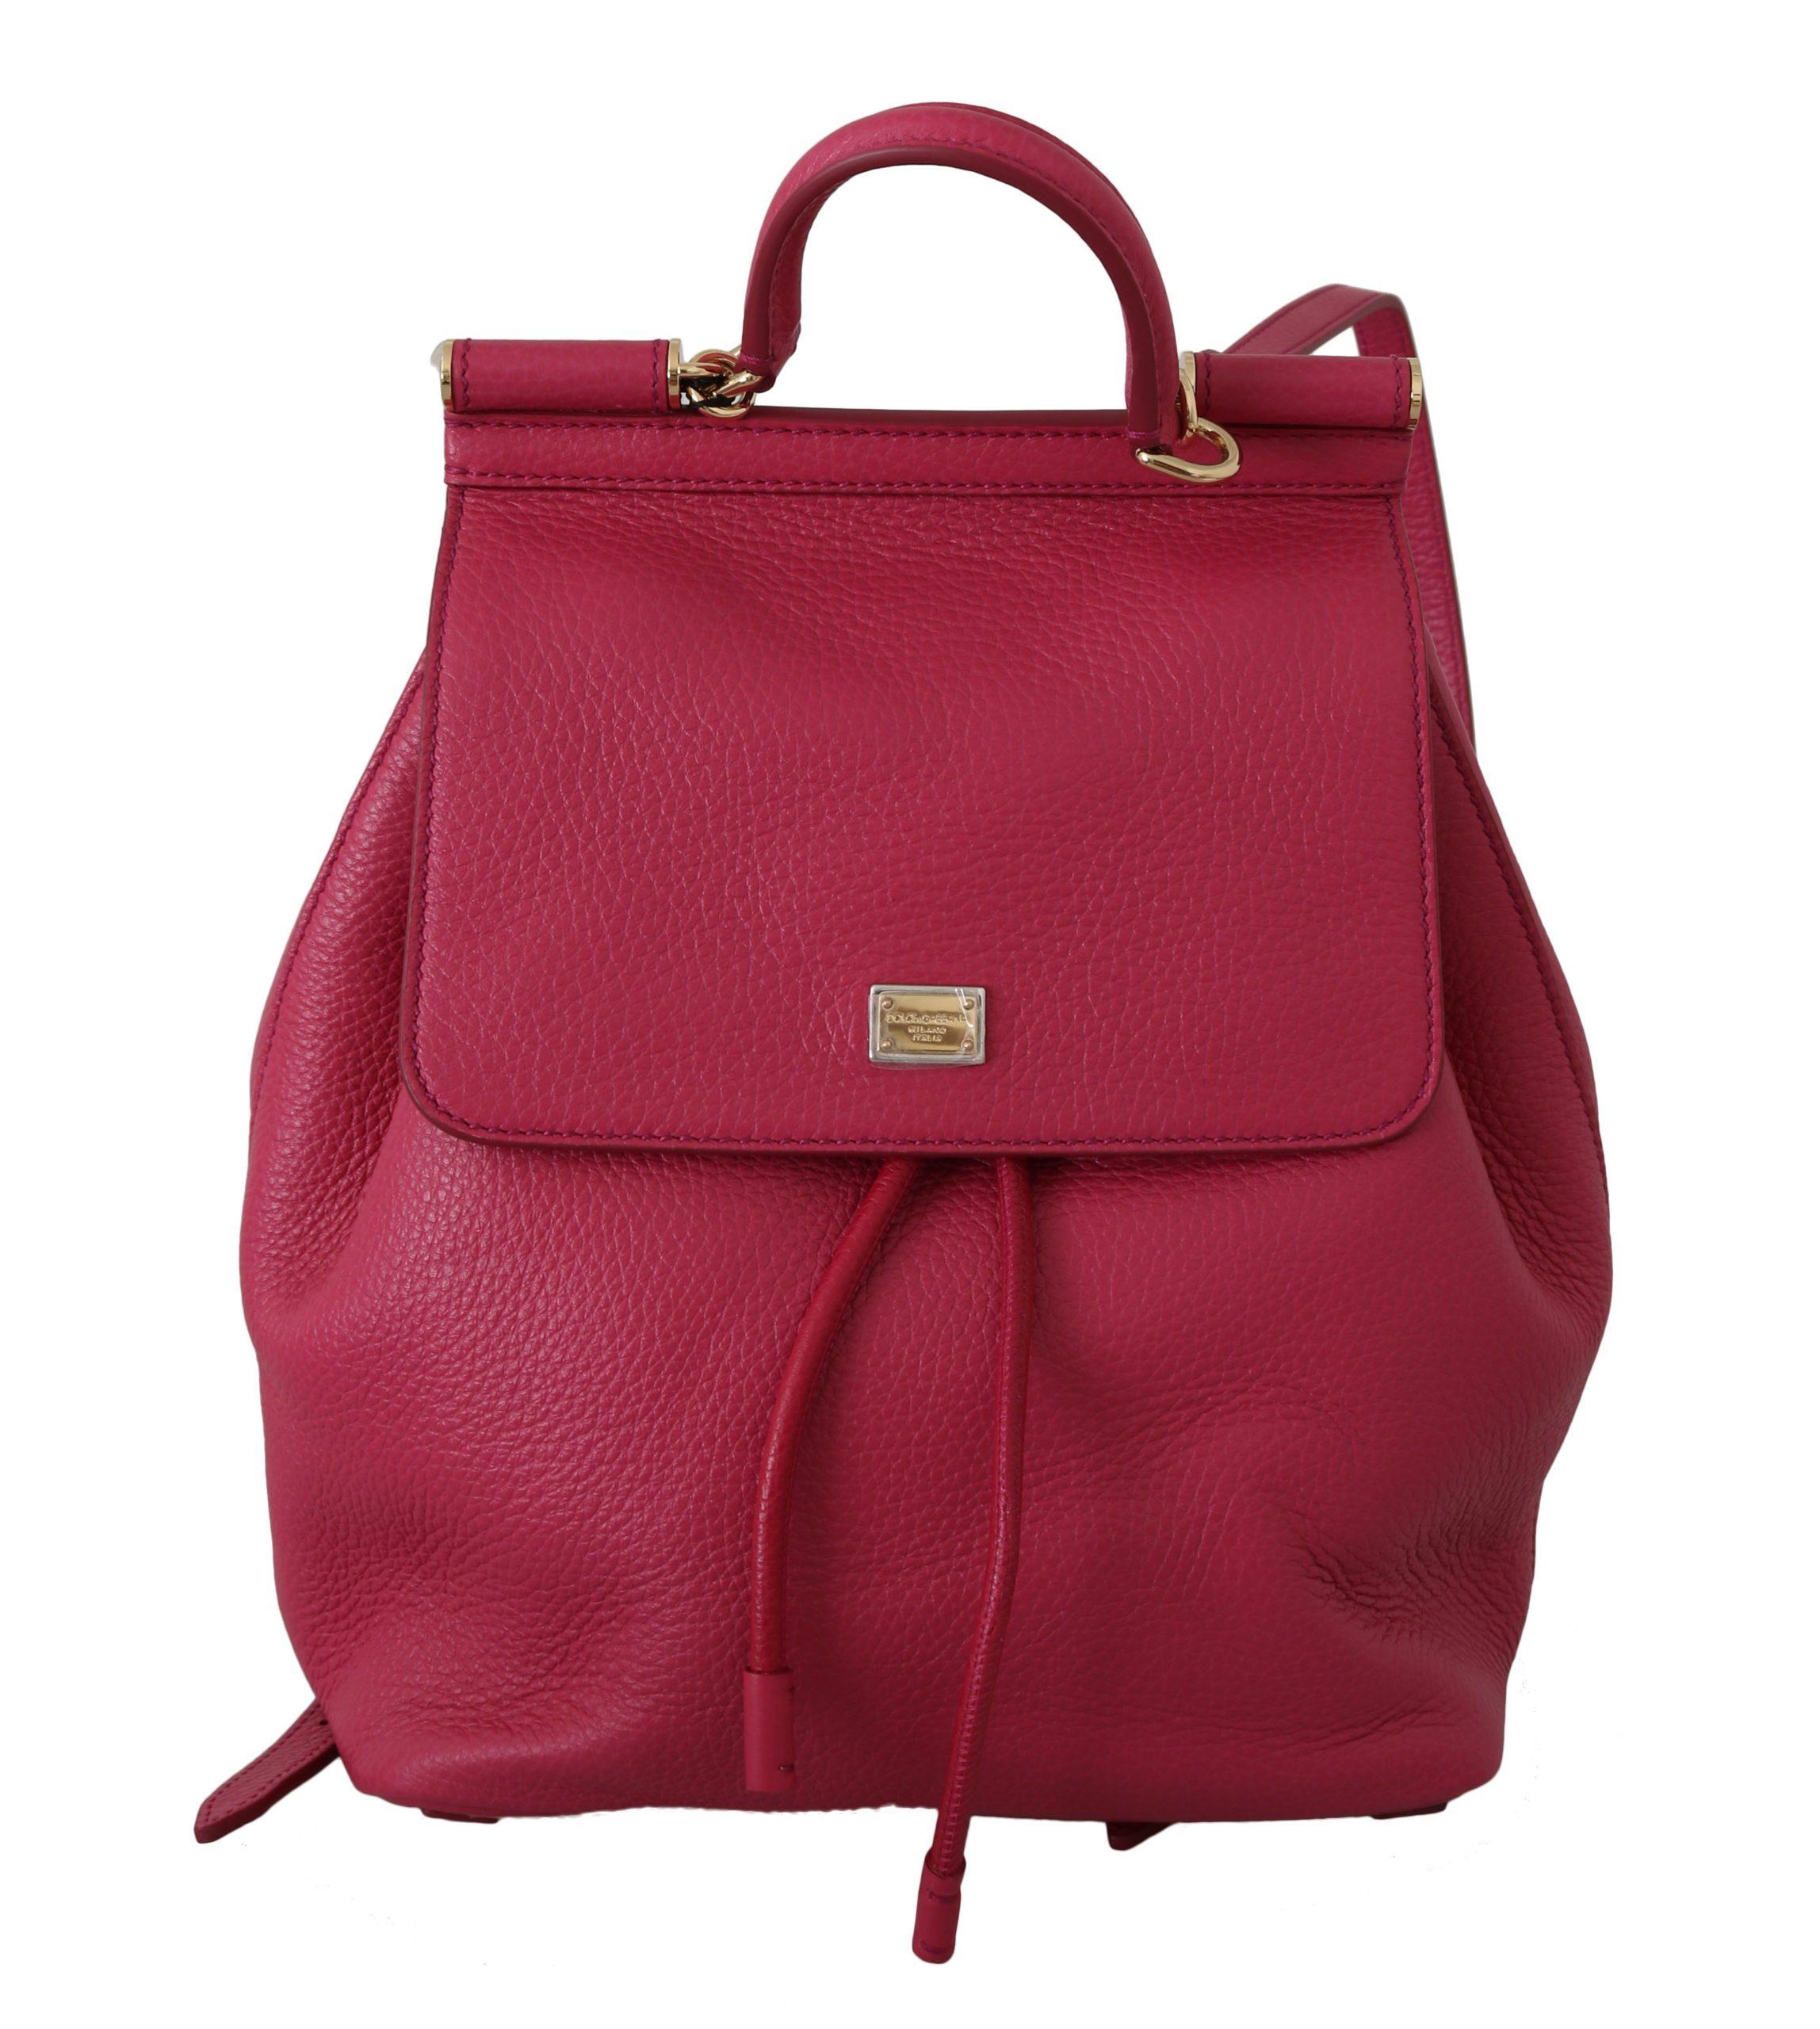 Dolce & Gabbana Women's Leather SICILY Backpack Pink VA8832